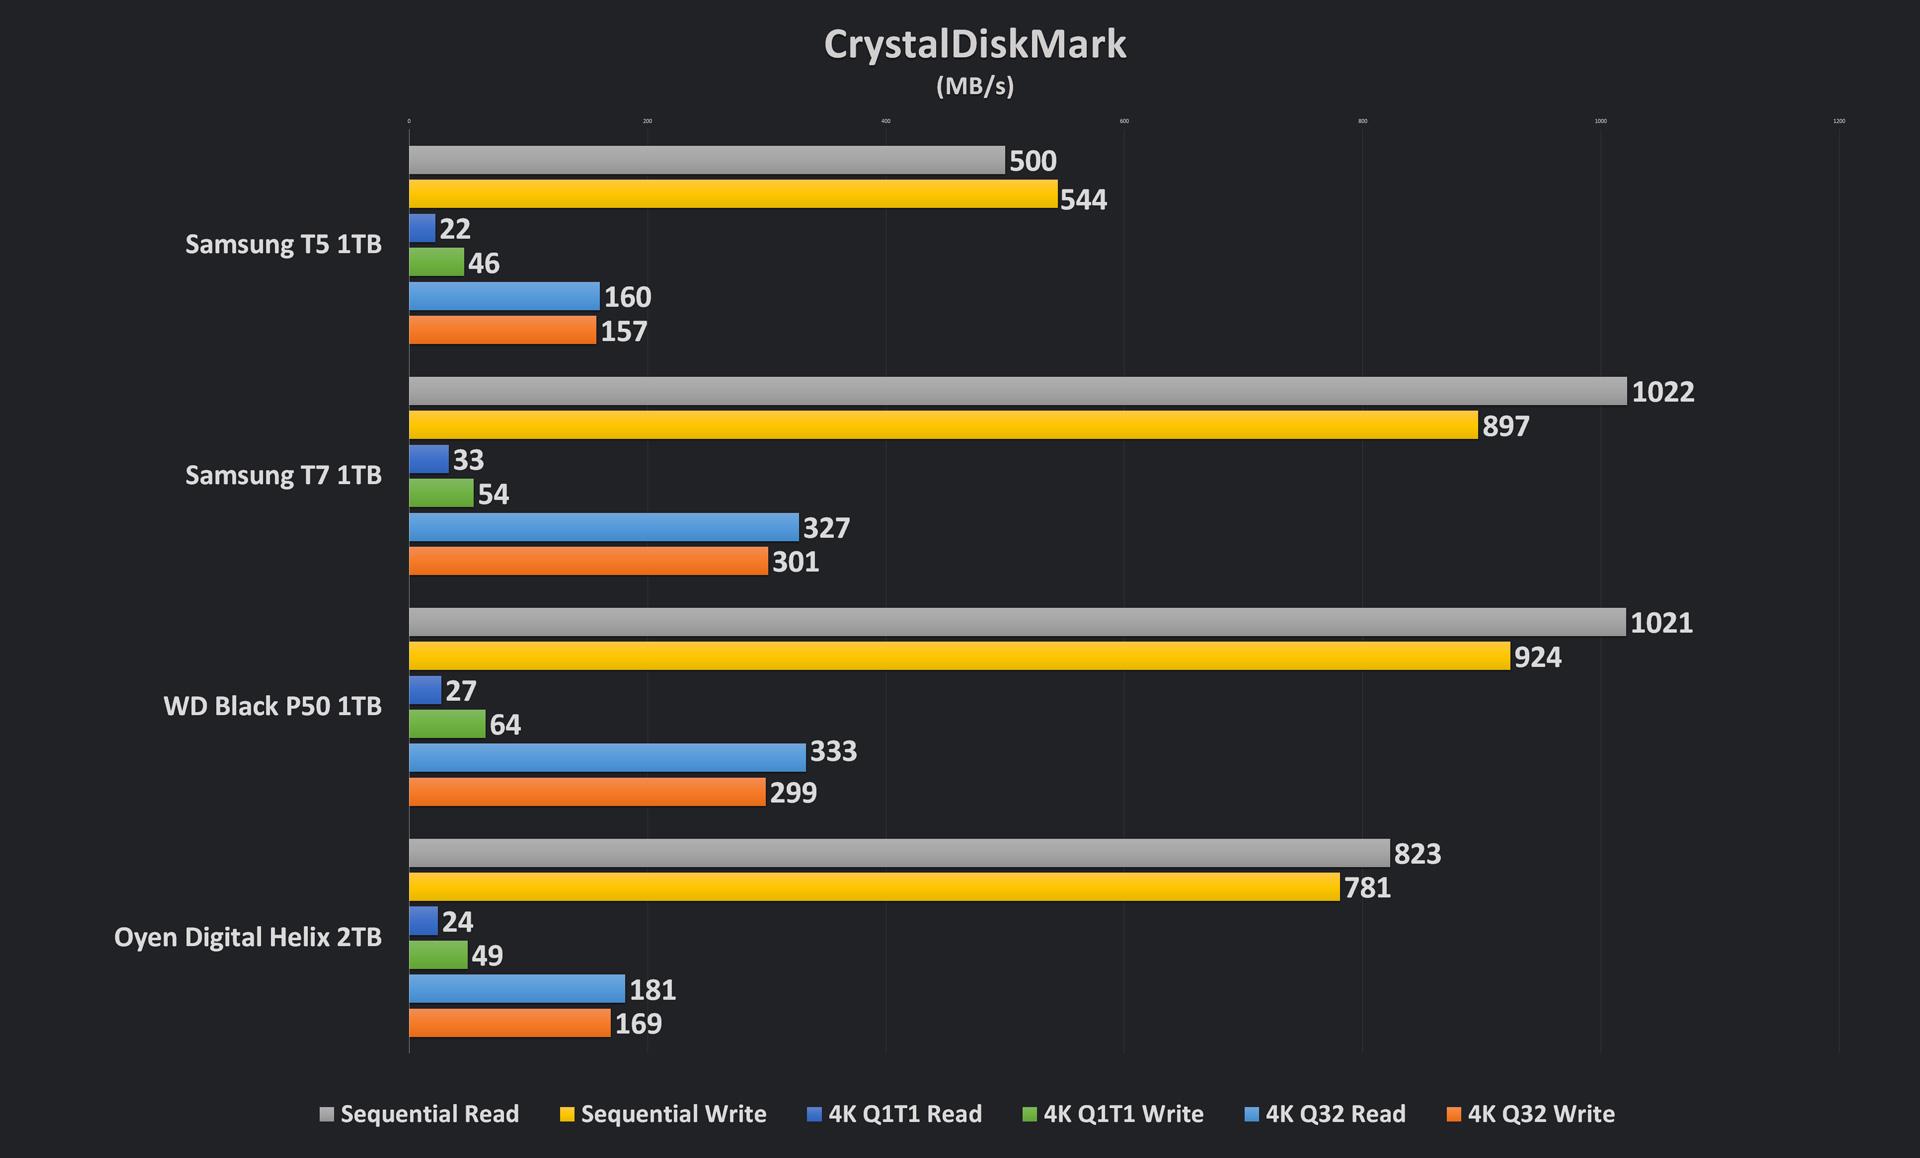 T7 SSD CrystalDiskMark